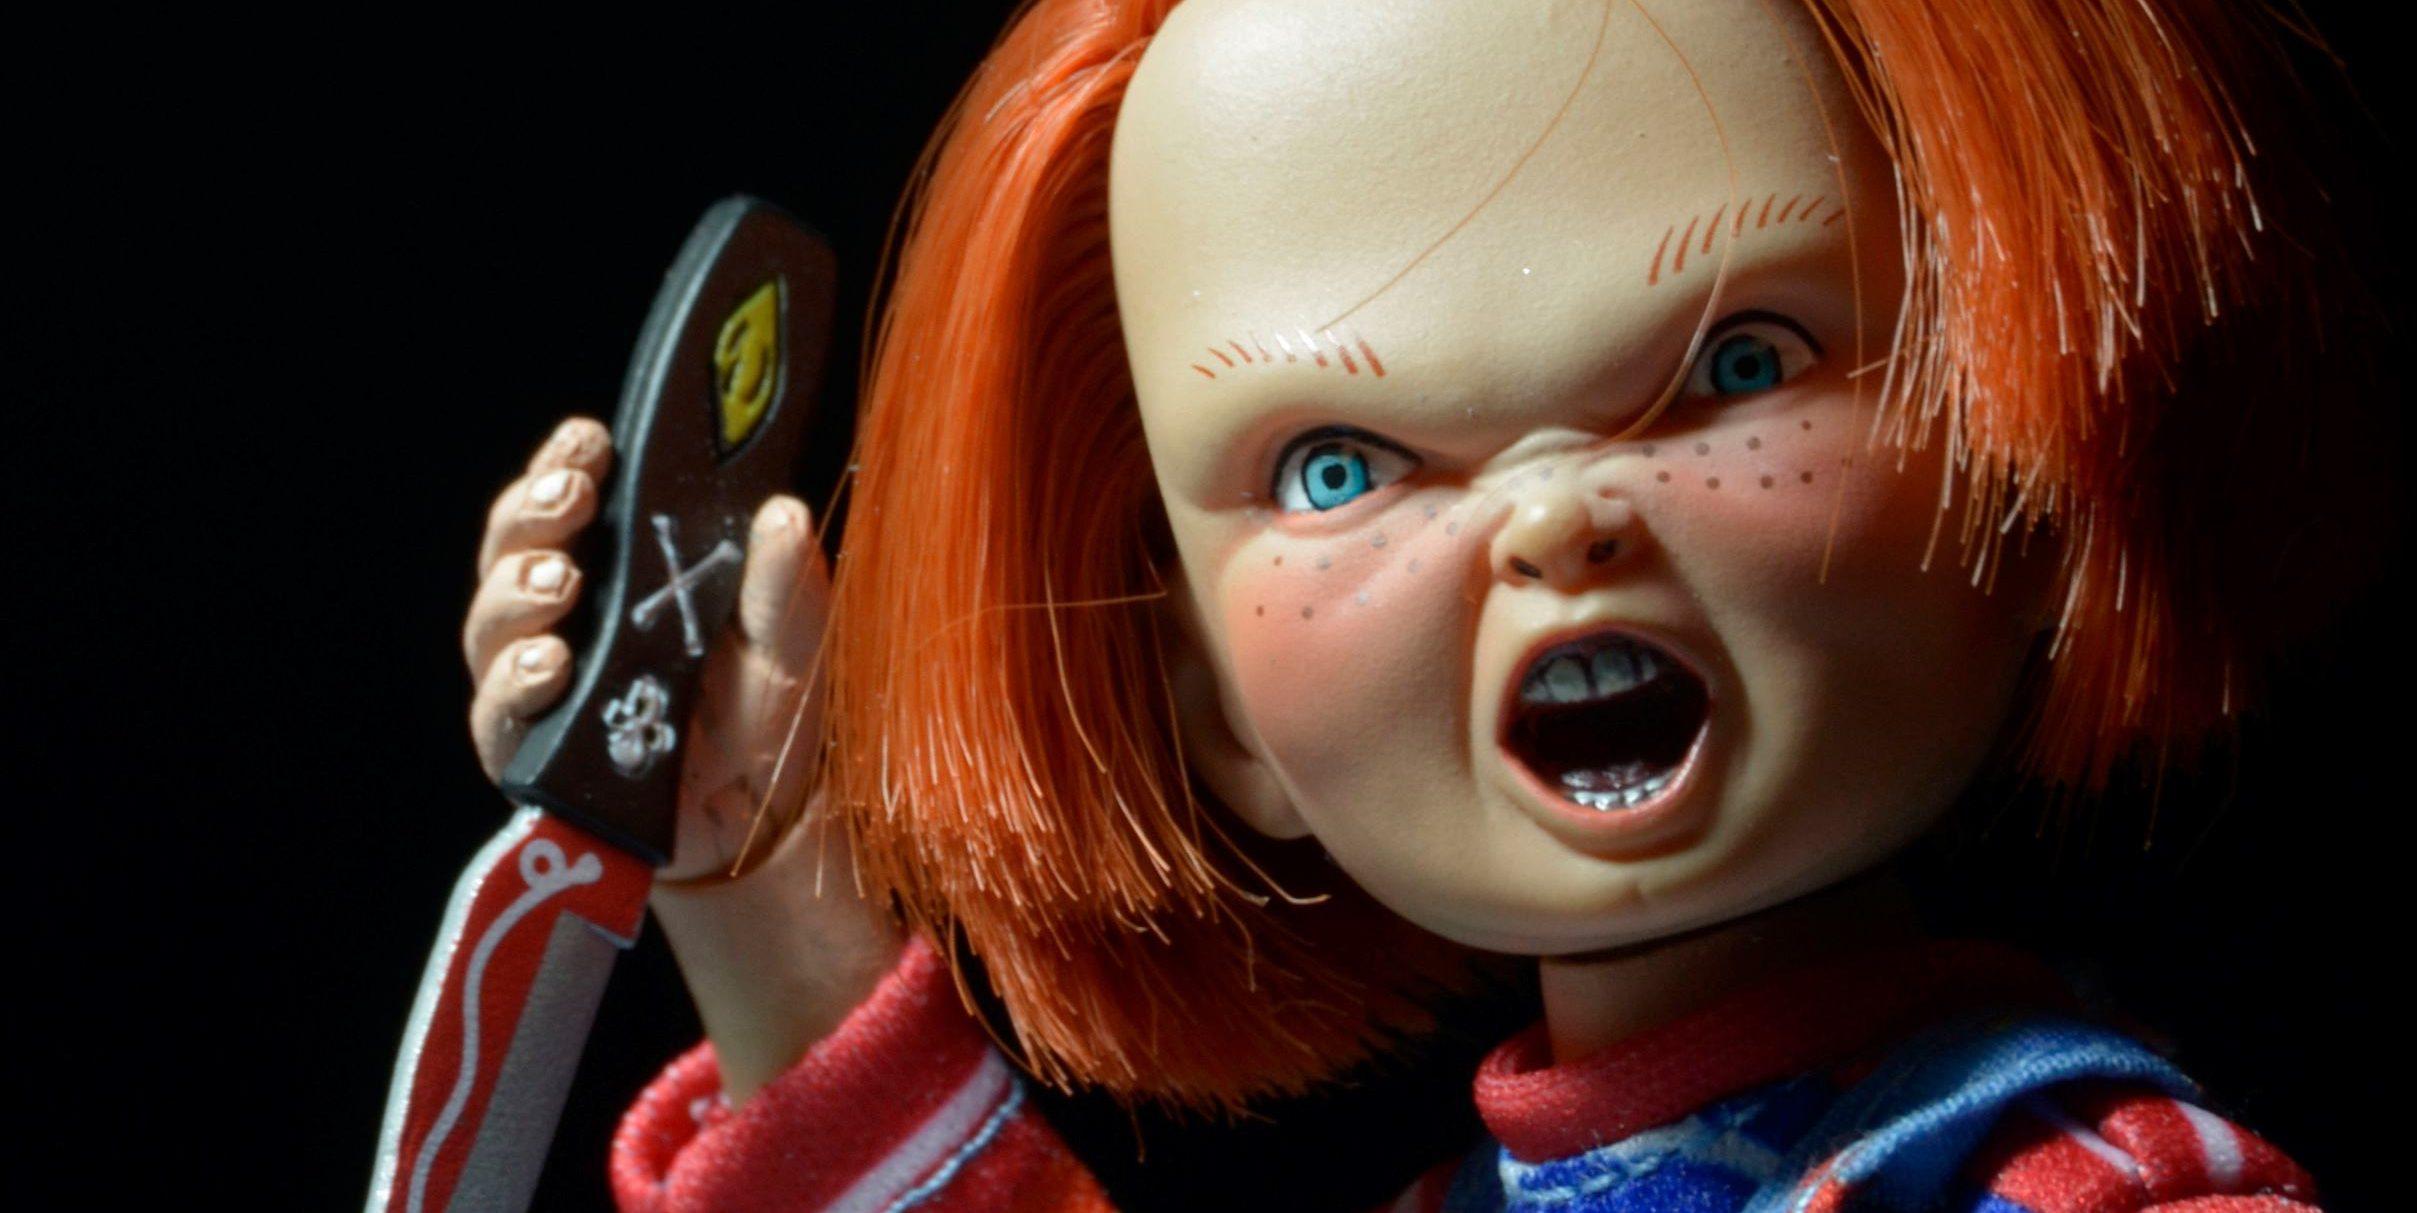 Confira o visual de Chucky no remake do clássico filme